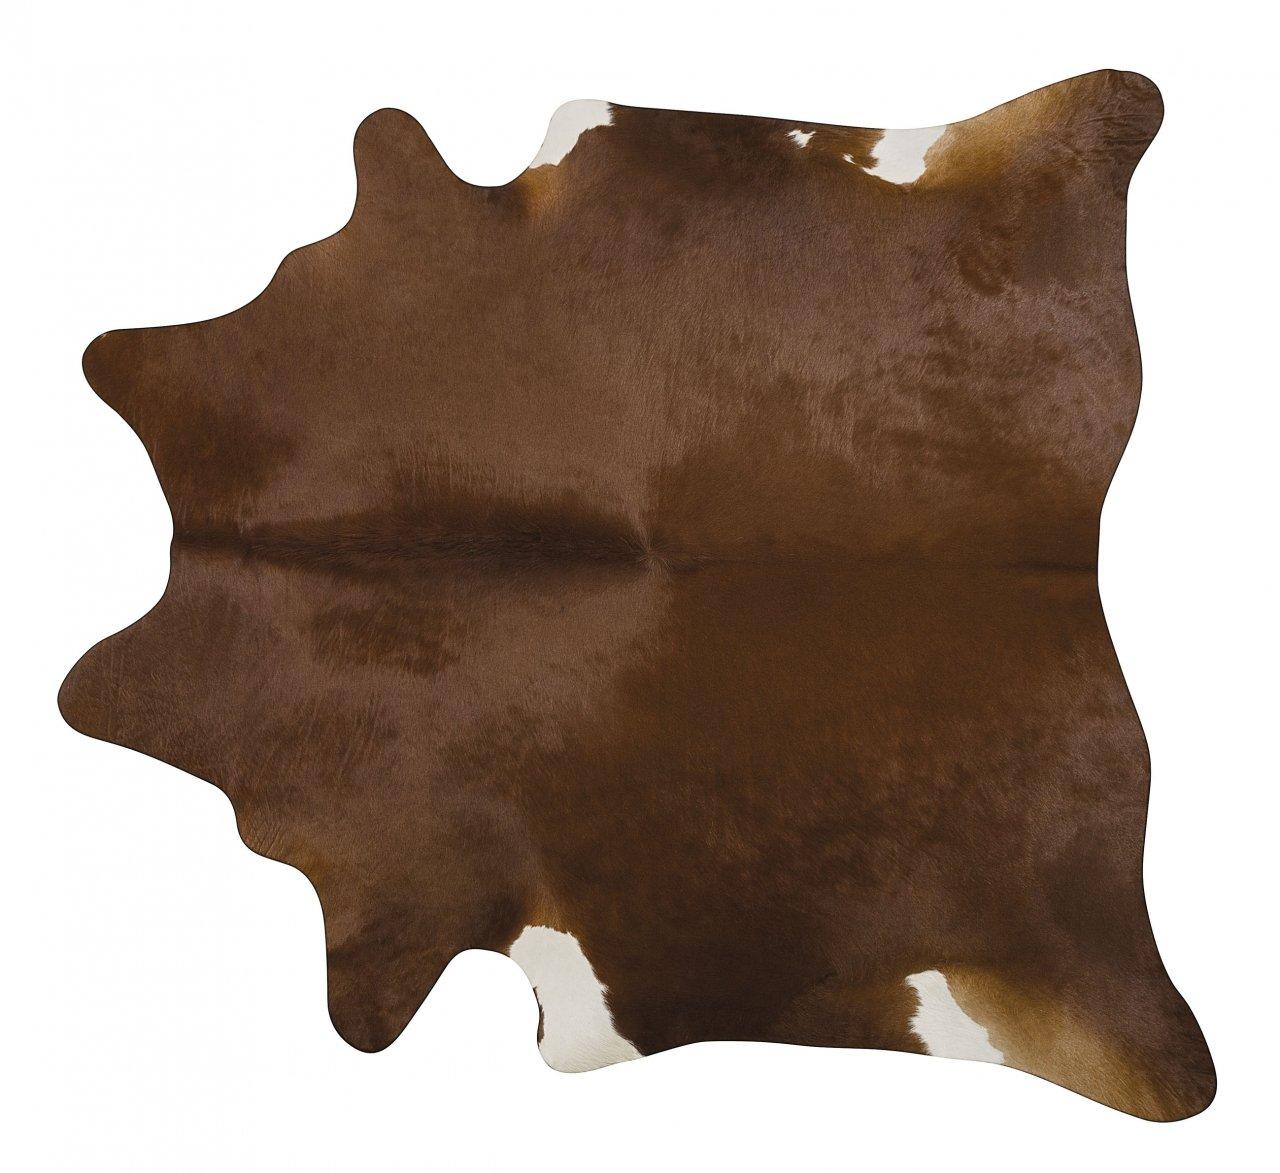 Dark Brown Brazilian Cowhide Area Rug - Size XL